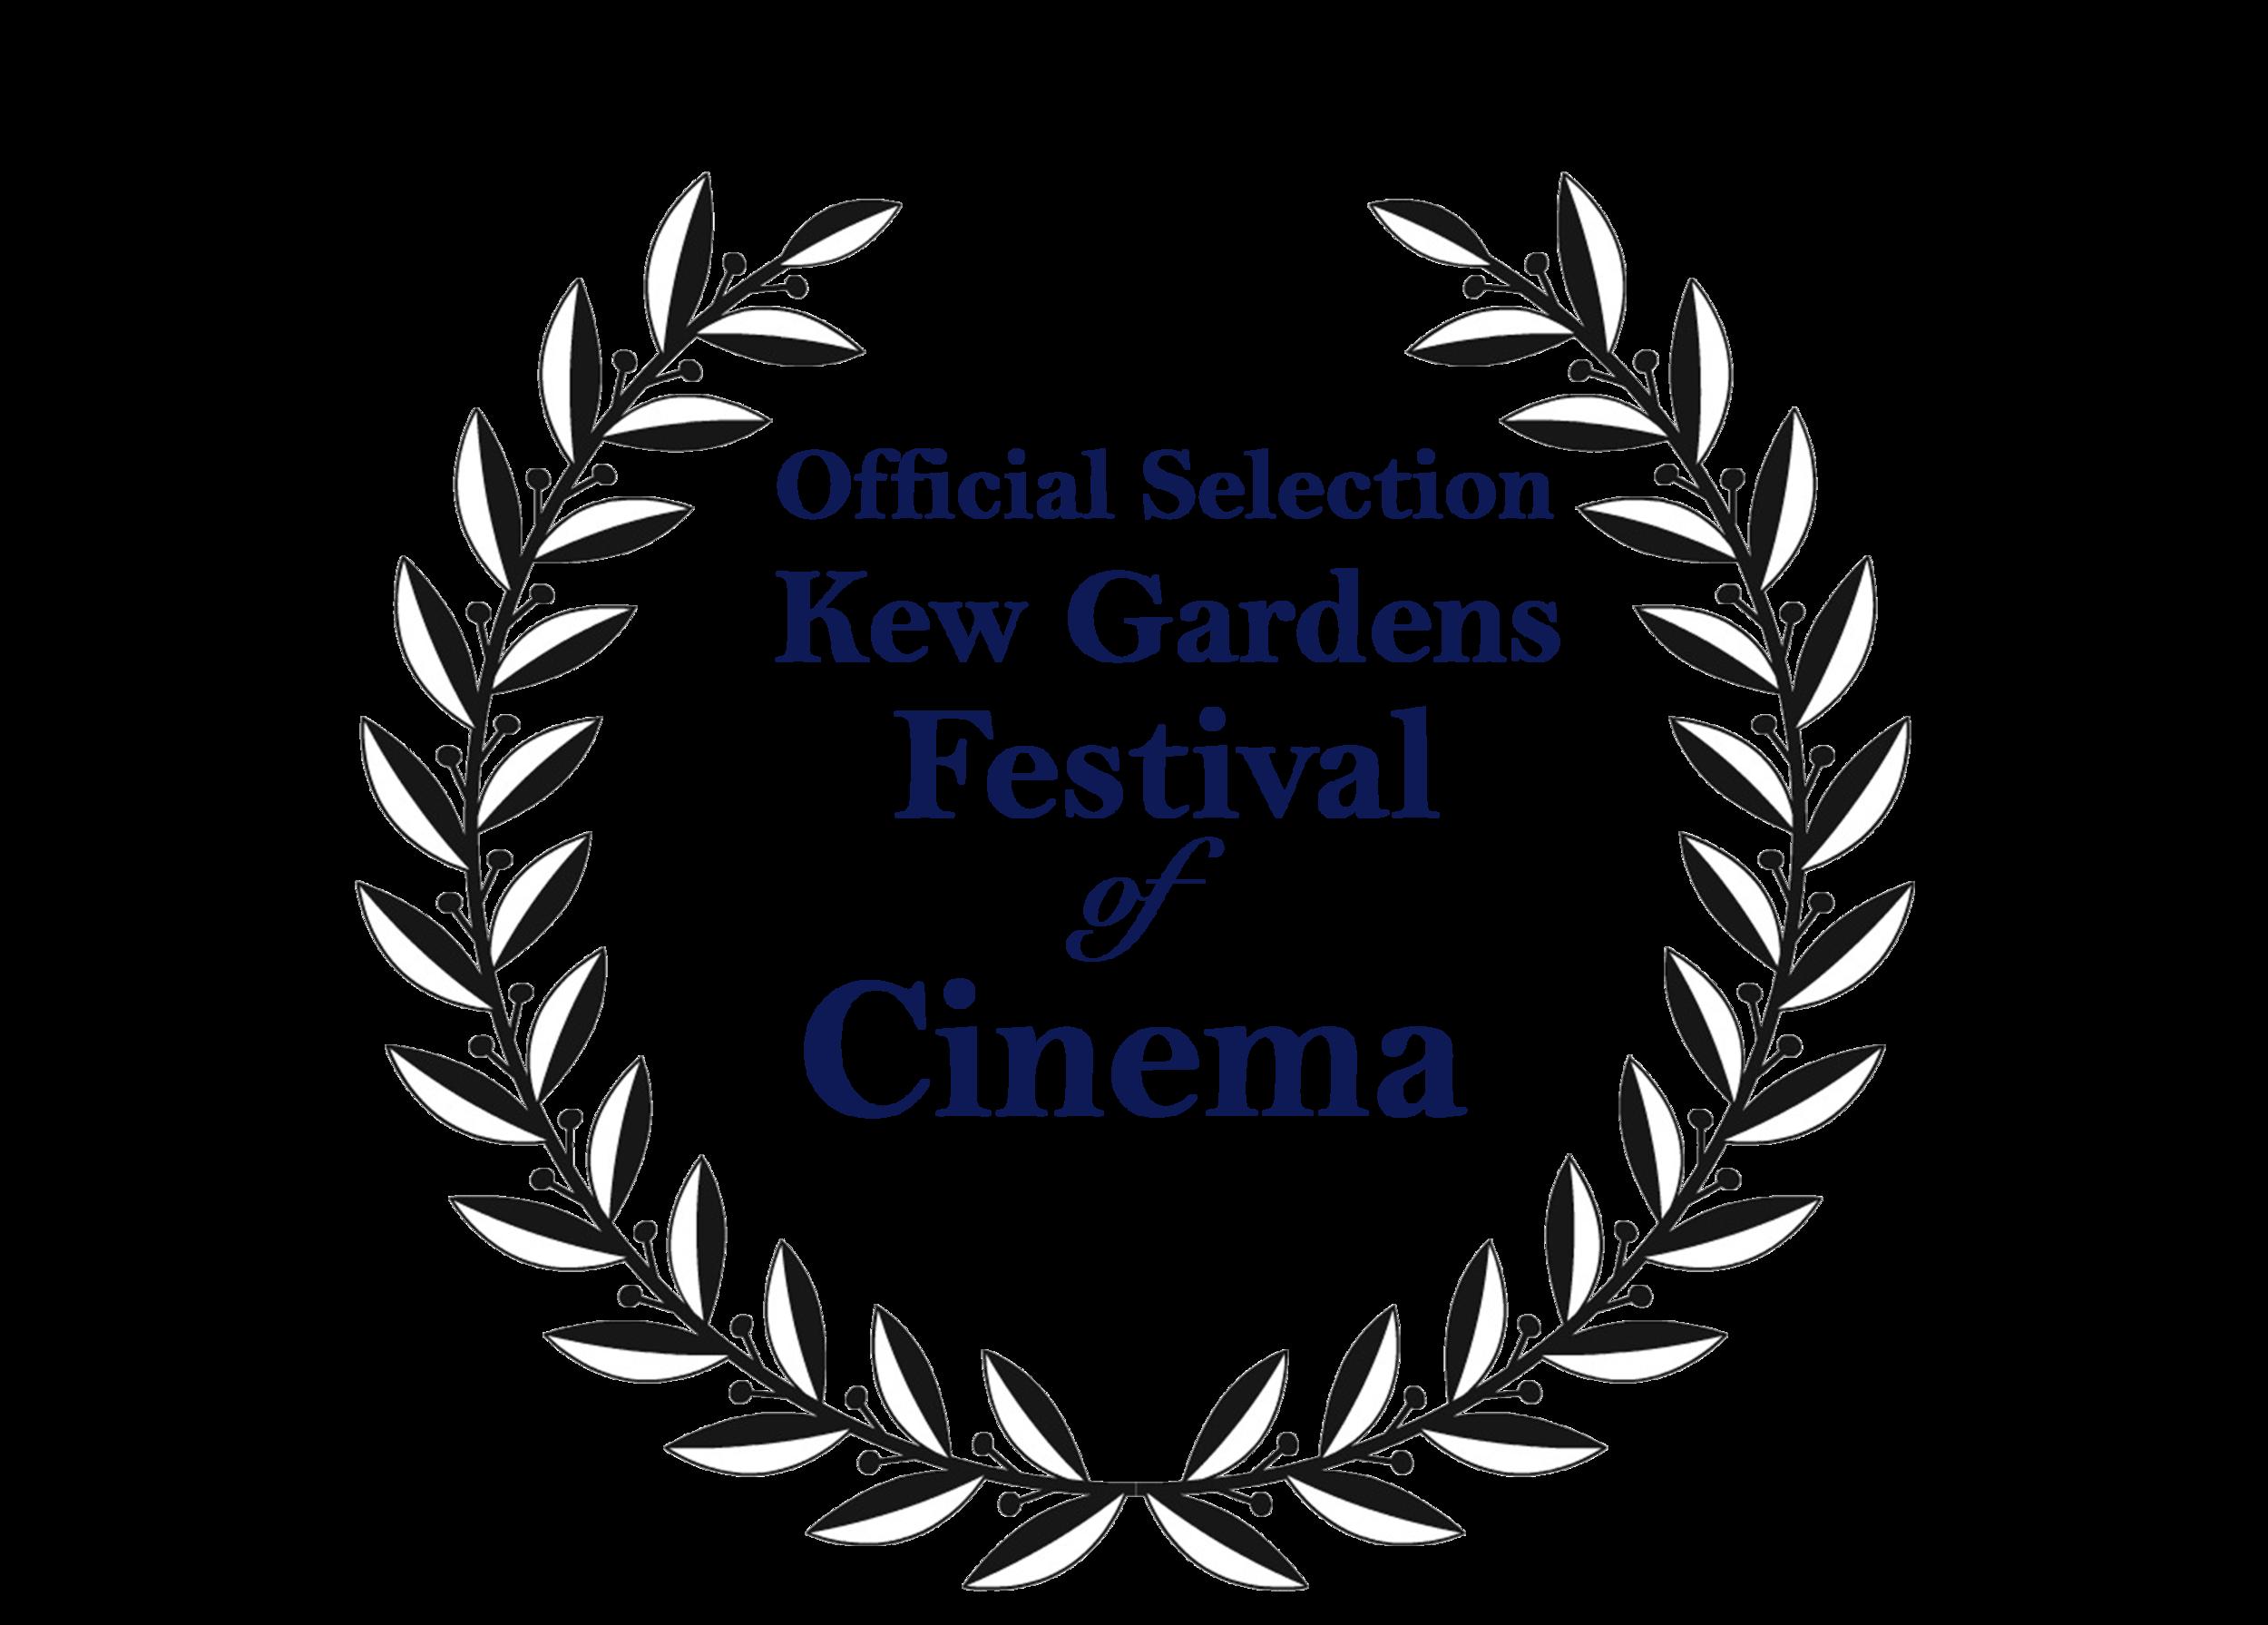 Kew Gardens Festival of Cinema_Black.png